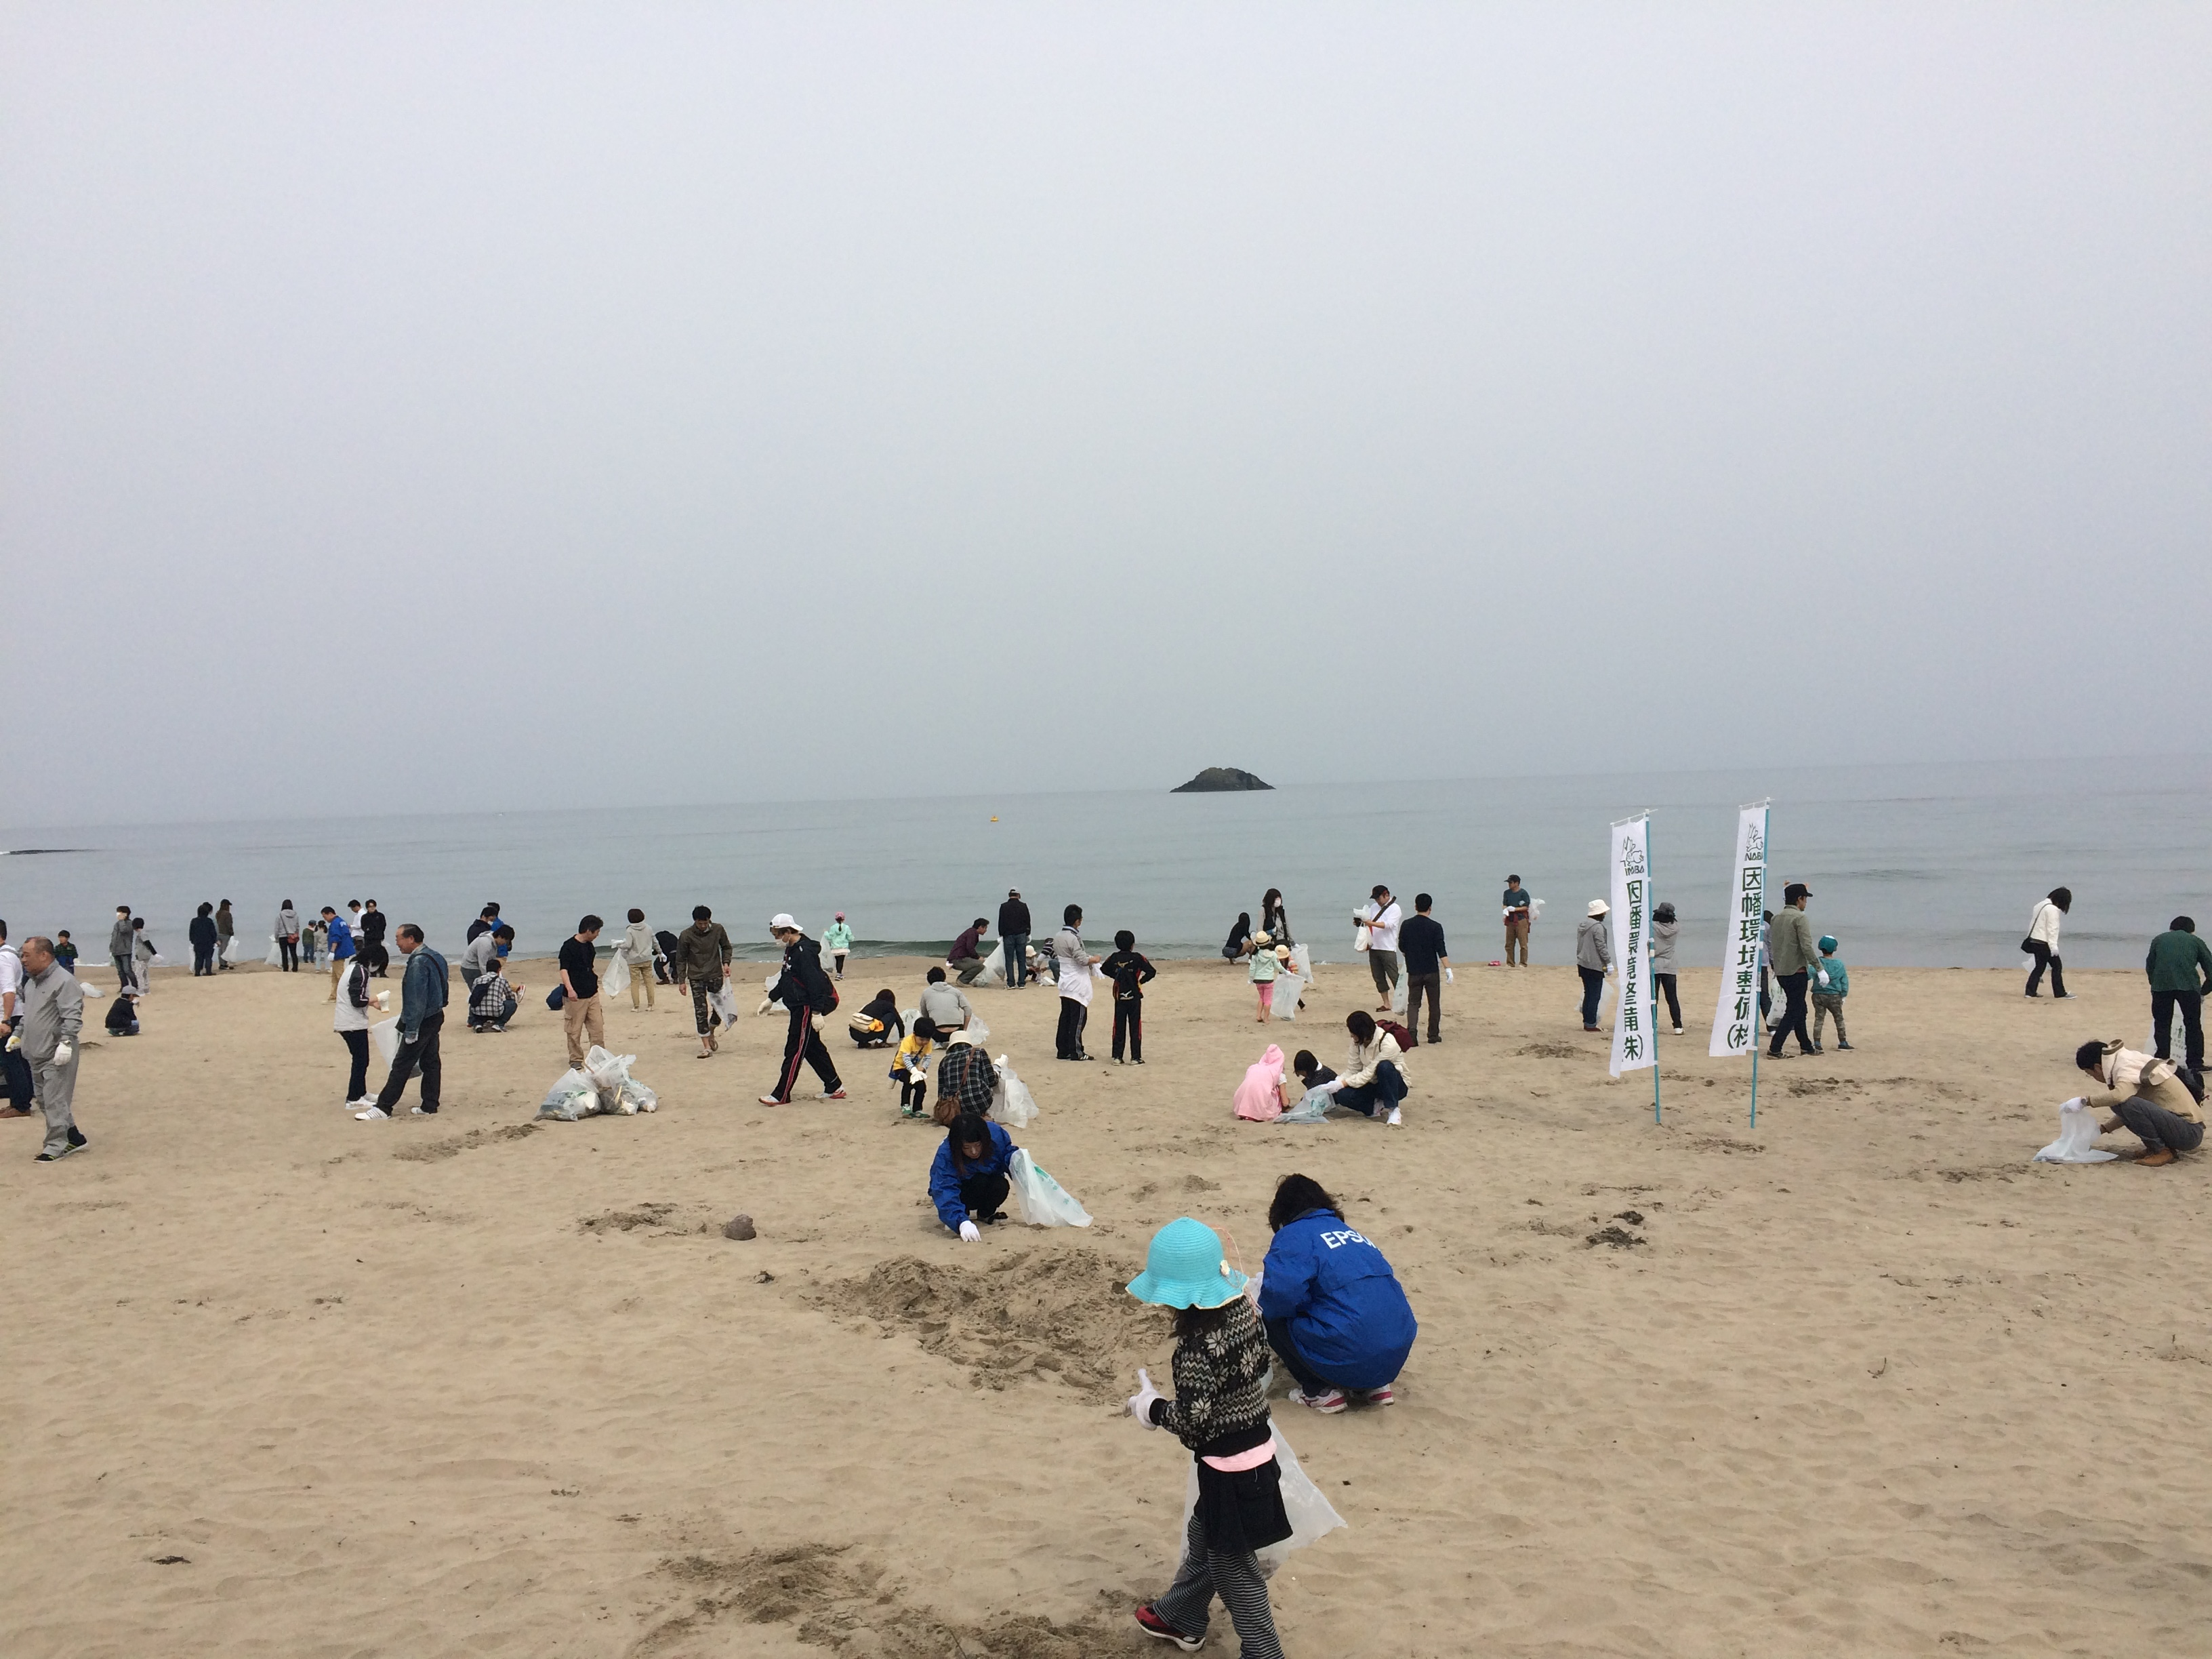 http://www.inaba-kankyo.co.jp/news/photo/IMG_0320.JPG